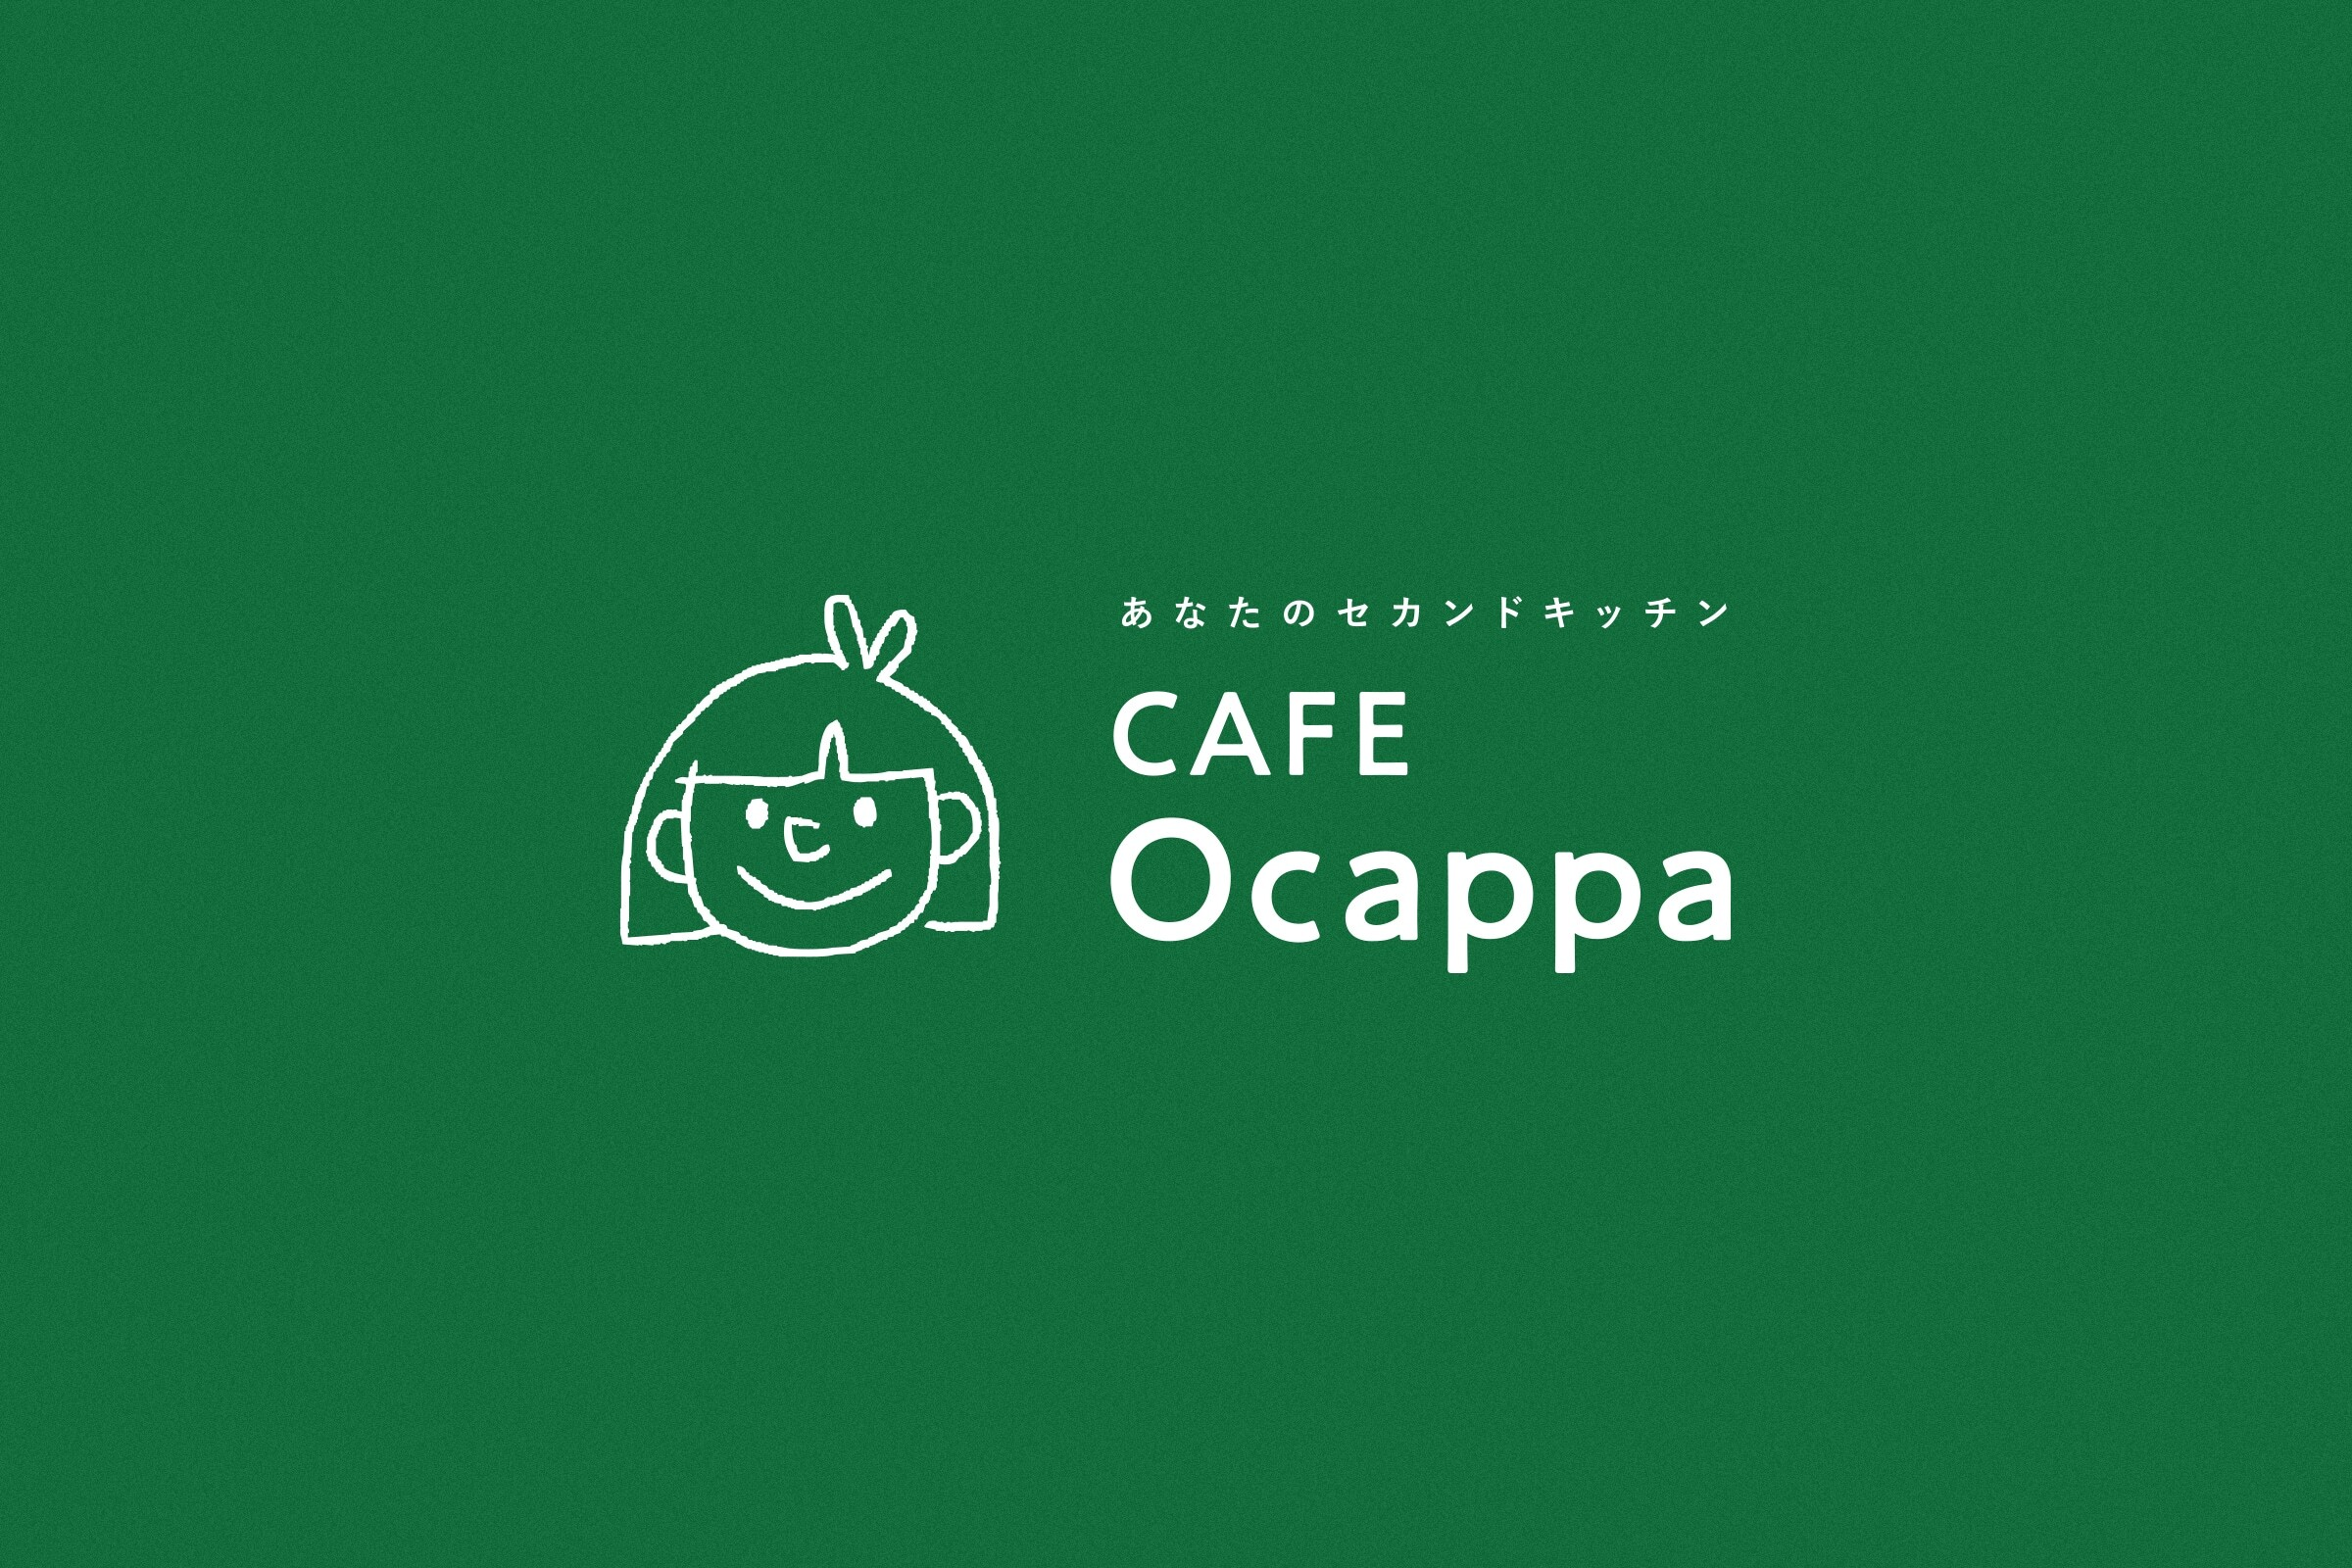 CAFE Ocappa|カフェ オカッパ